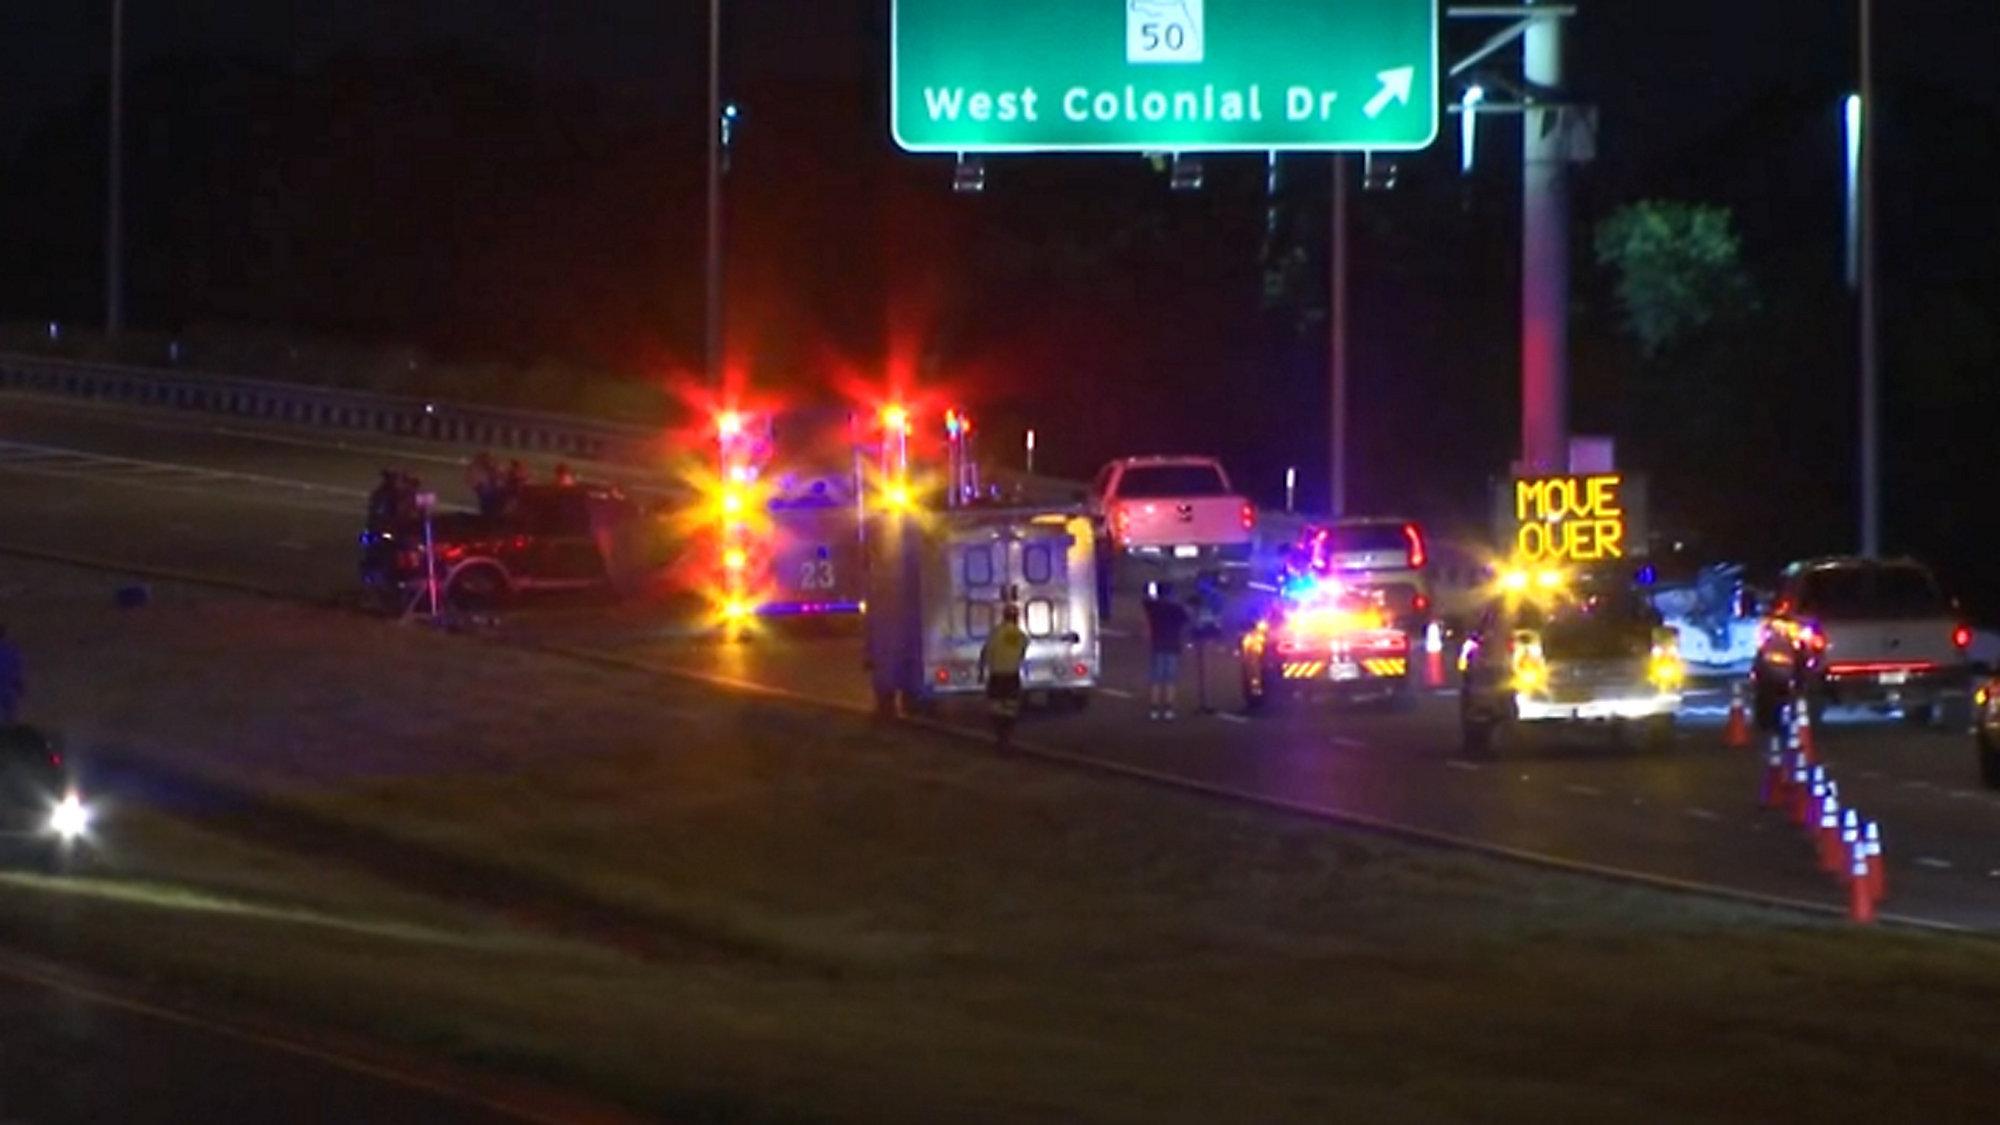 1 Dead After Pickup Truck Overturns in West Orange County